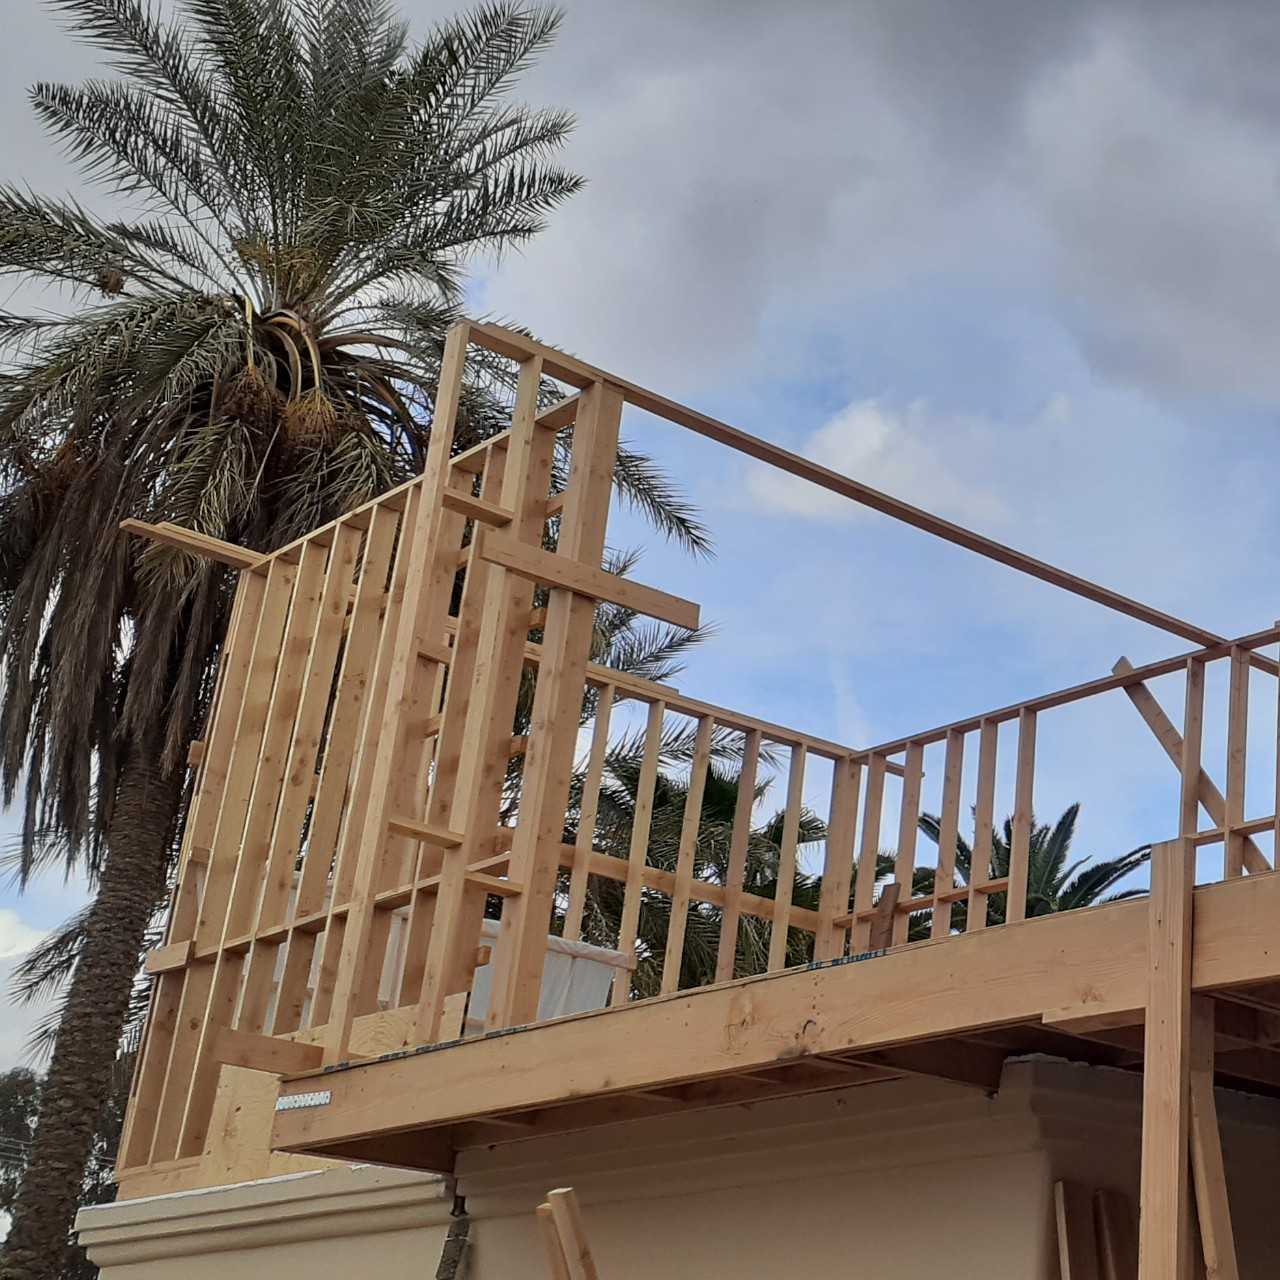 carpentry-wood-framing-second-floor-home-addition--framing-85